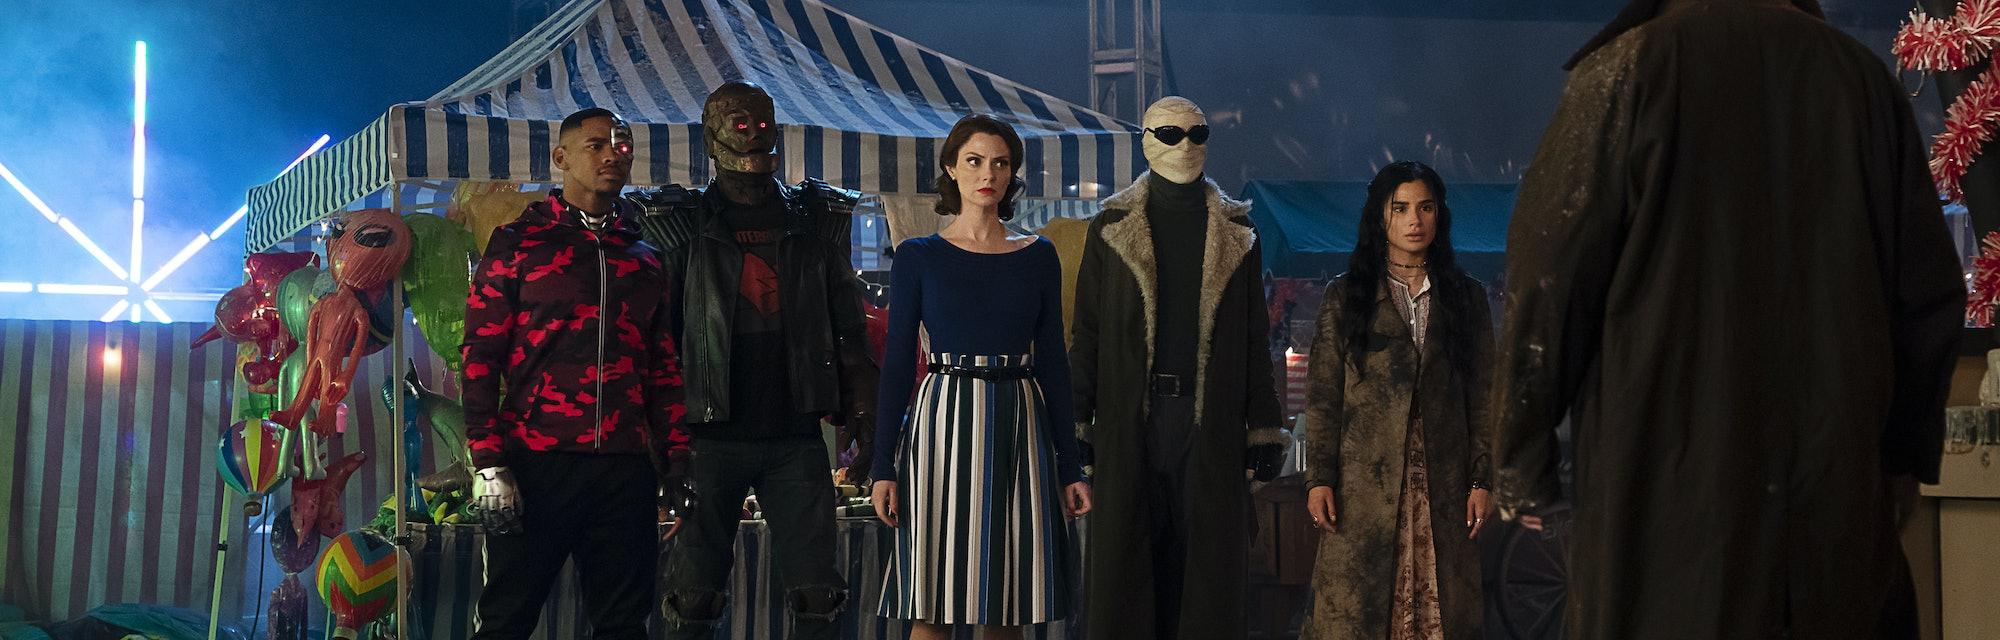 Doom Patrol' Season 3 release date, trailer, cast, plot of HBO Max show